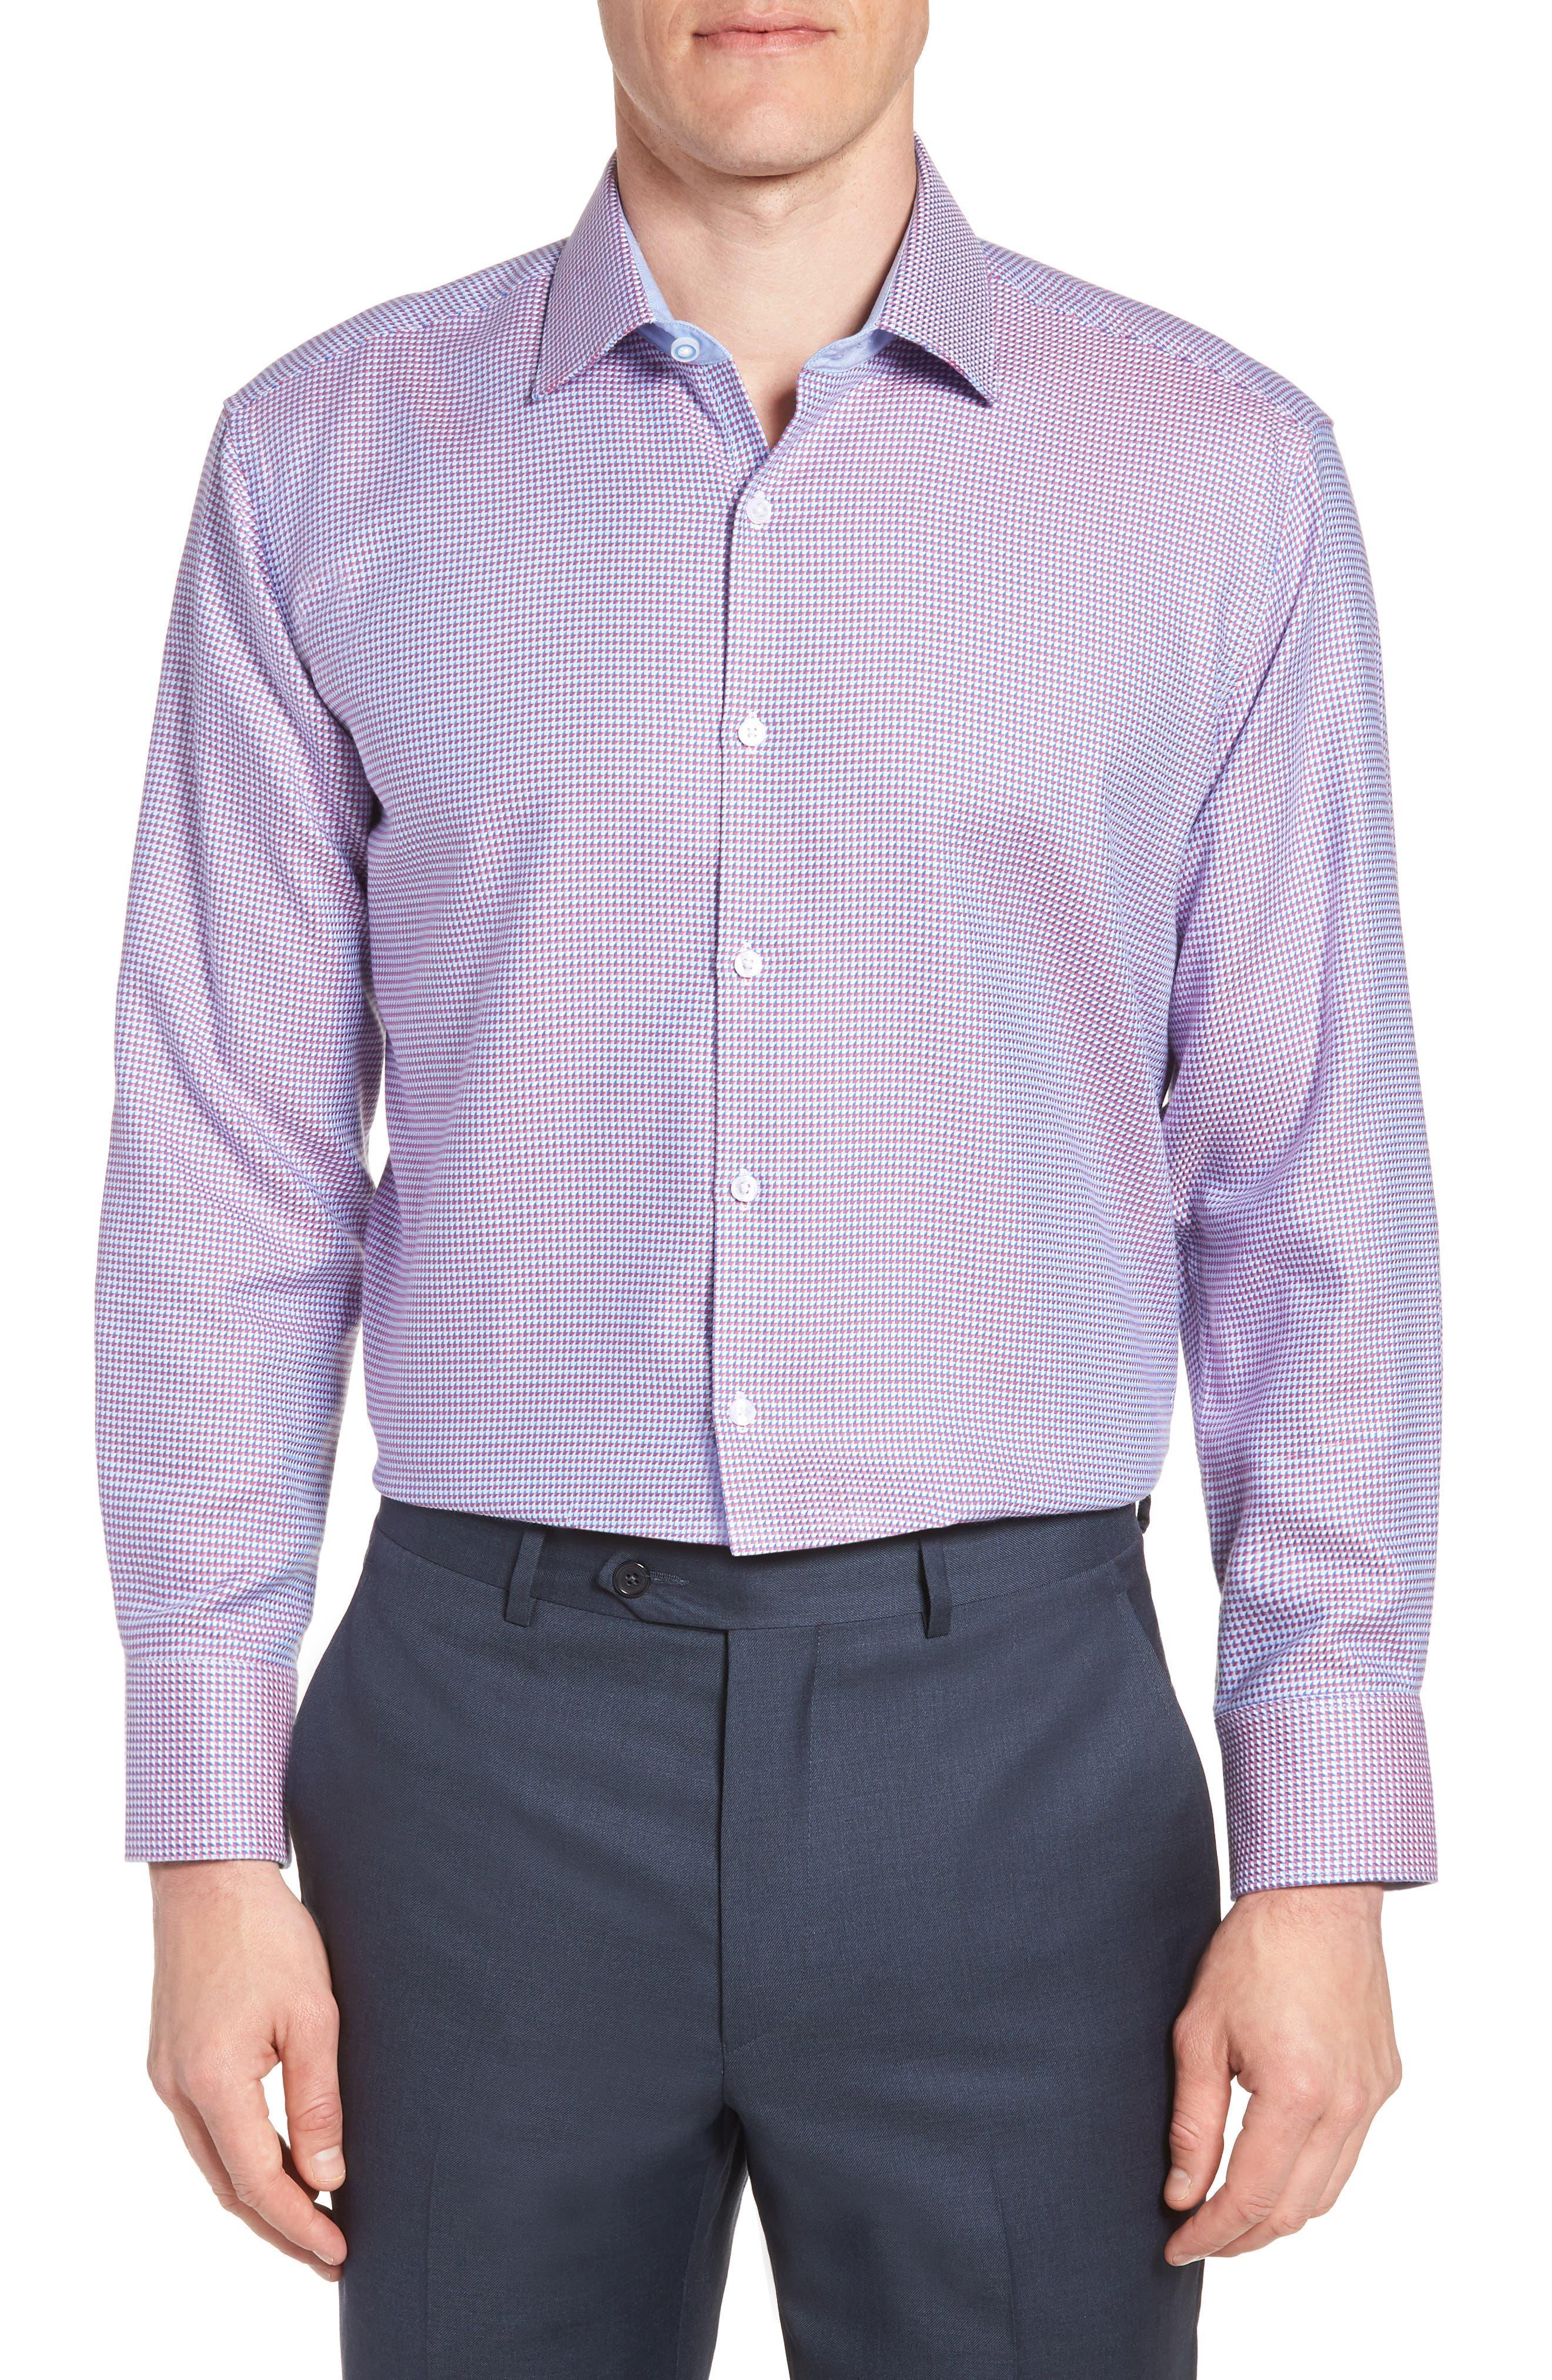 Axton Trim Fit Geometric Dress Shirt,                         Main,                         color, 400